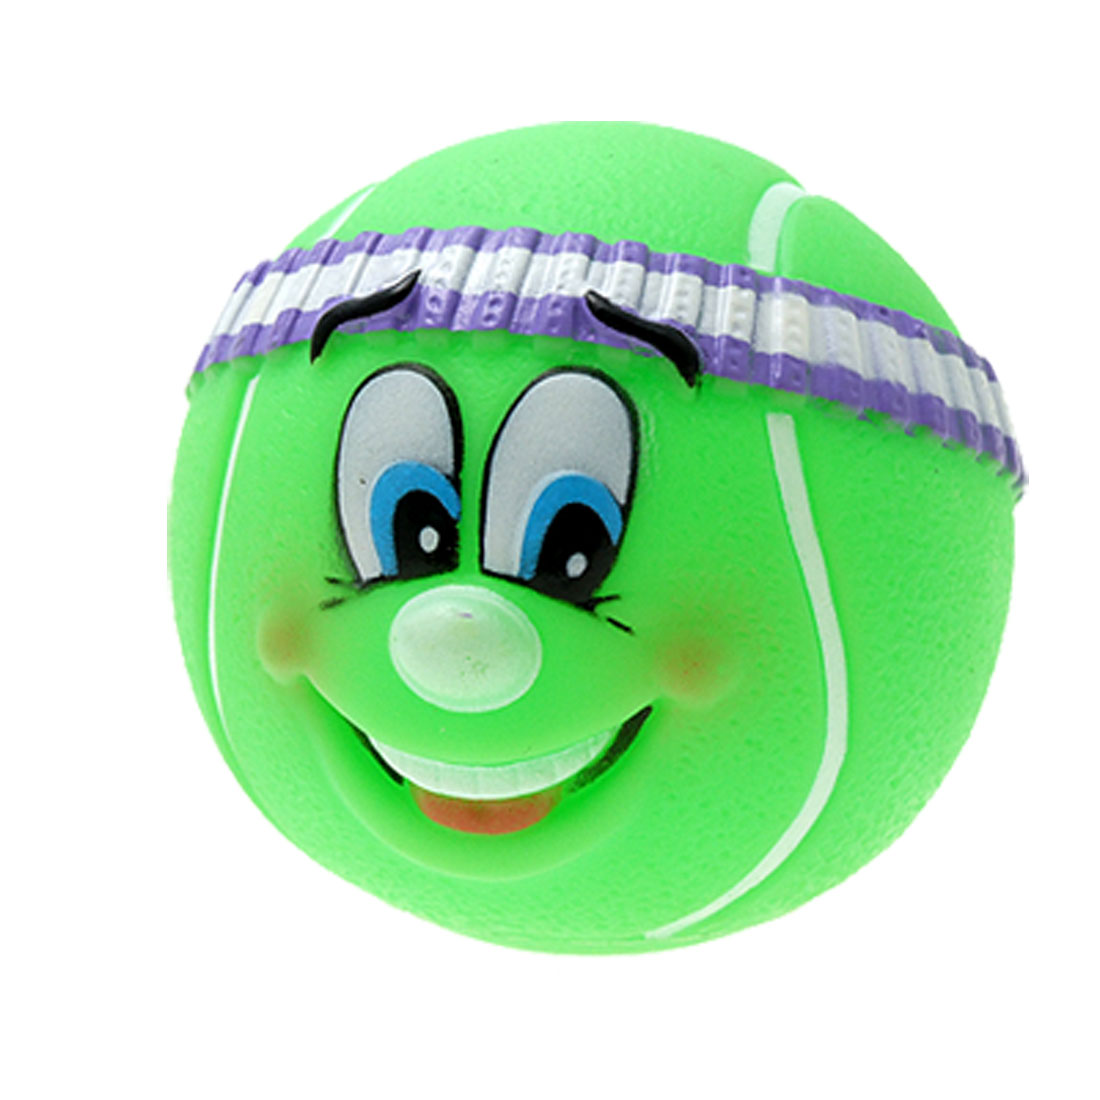 Pet Toy Rubber Tennis Ball Pattern Vinyl Squeaker Fetch Puppy Chew Sound Green